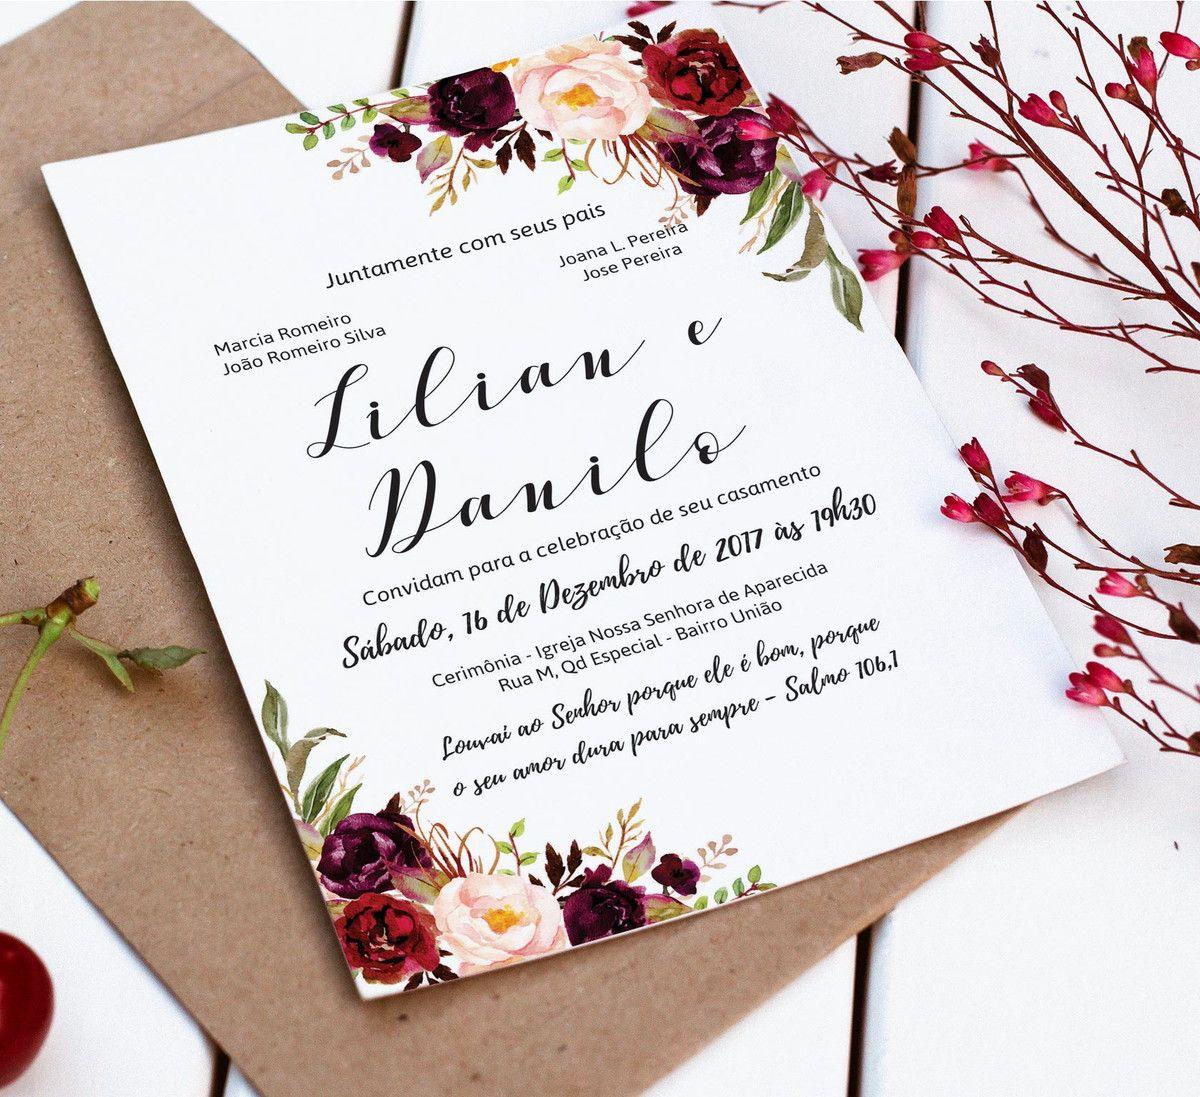 Convite Casamento Floral Digital Inclui A Arte Do Convite